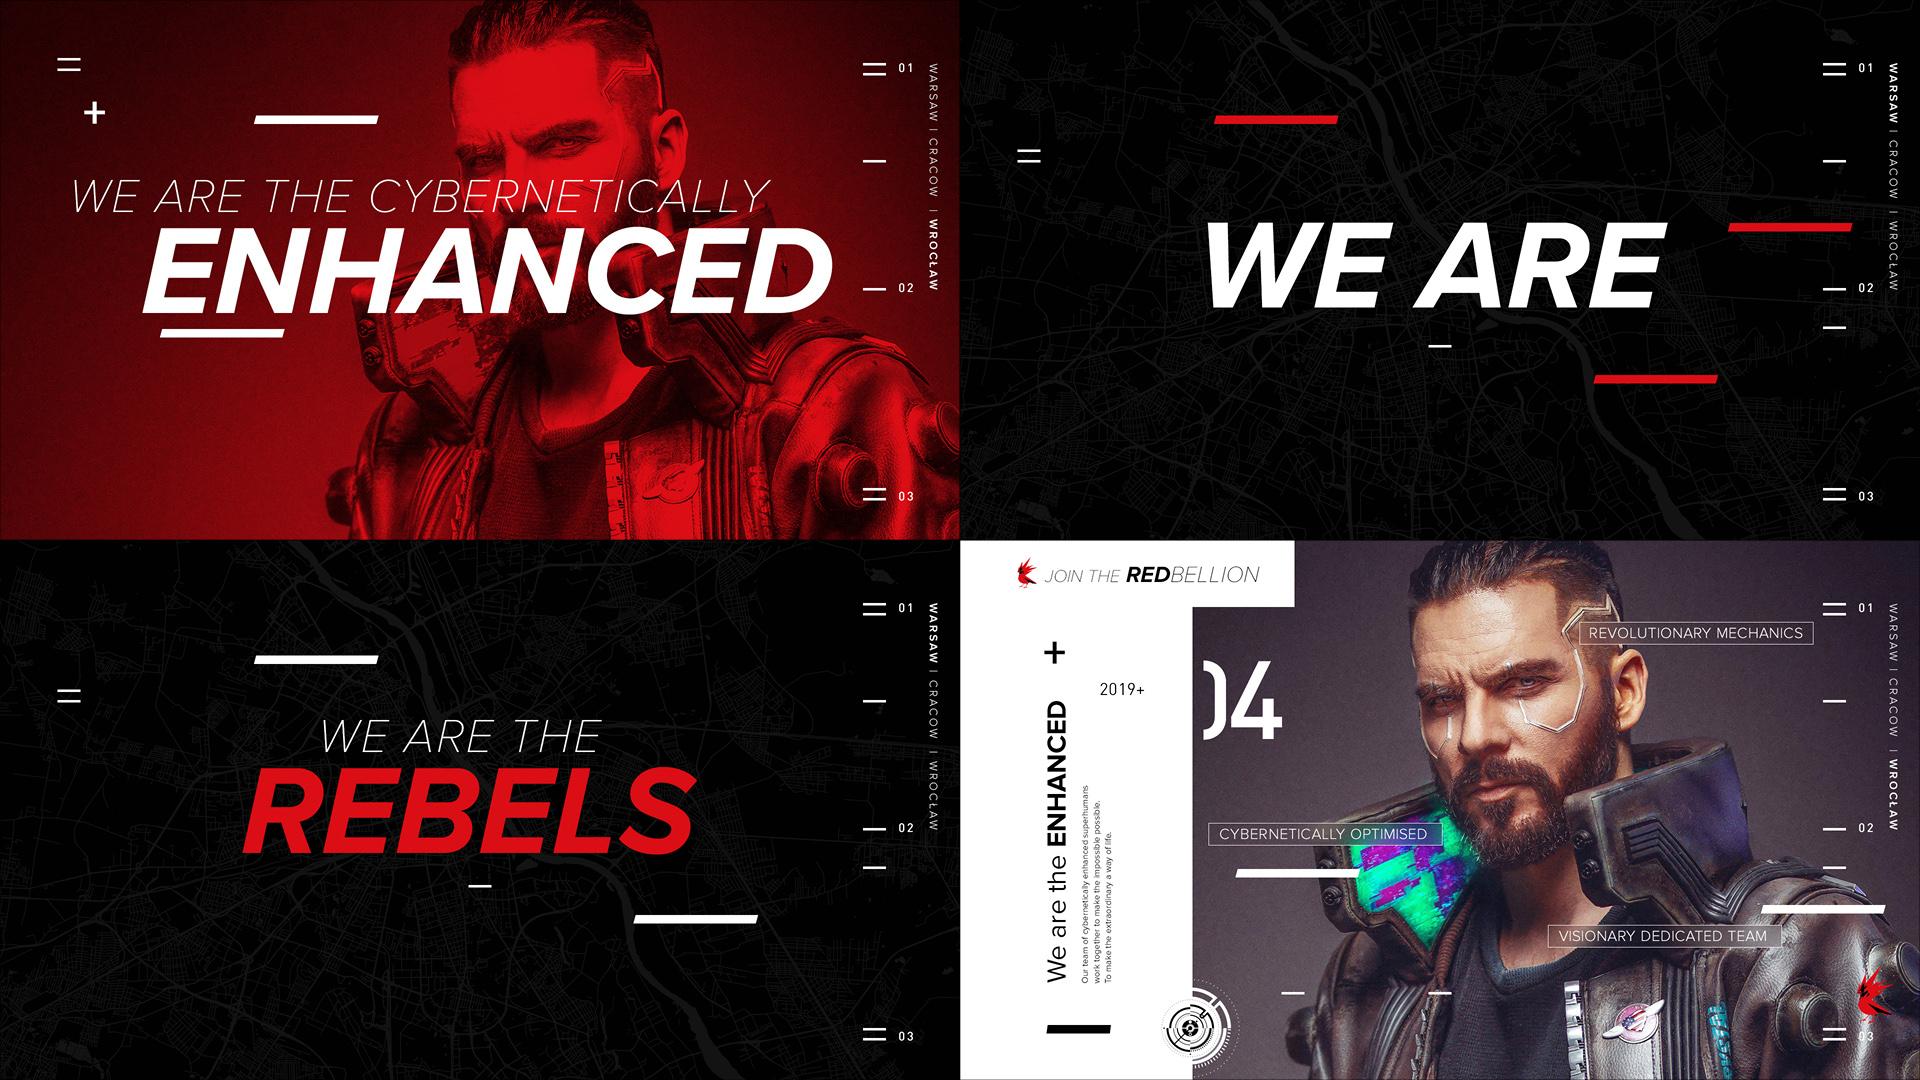 Cyberpunk 2077 designs for CD Projekt Red